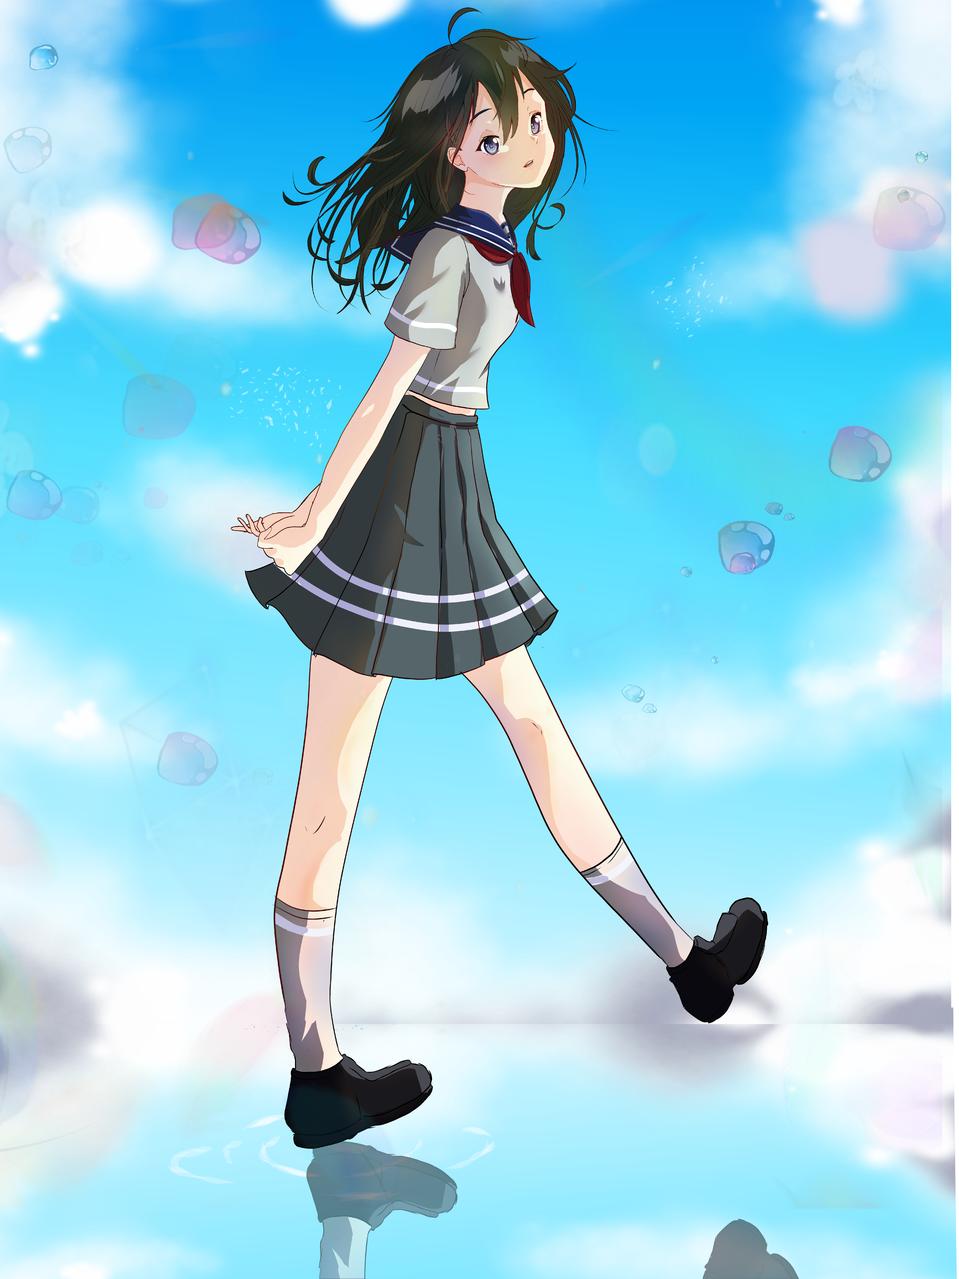 Yuri Nanami  Illust of Fari January2021_Contest:OC sky girl purpleEye blackhair medibangpaint blue oc